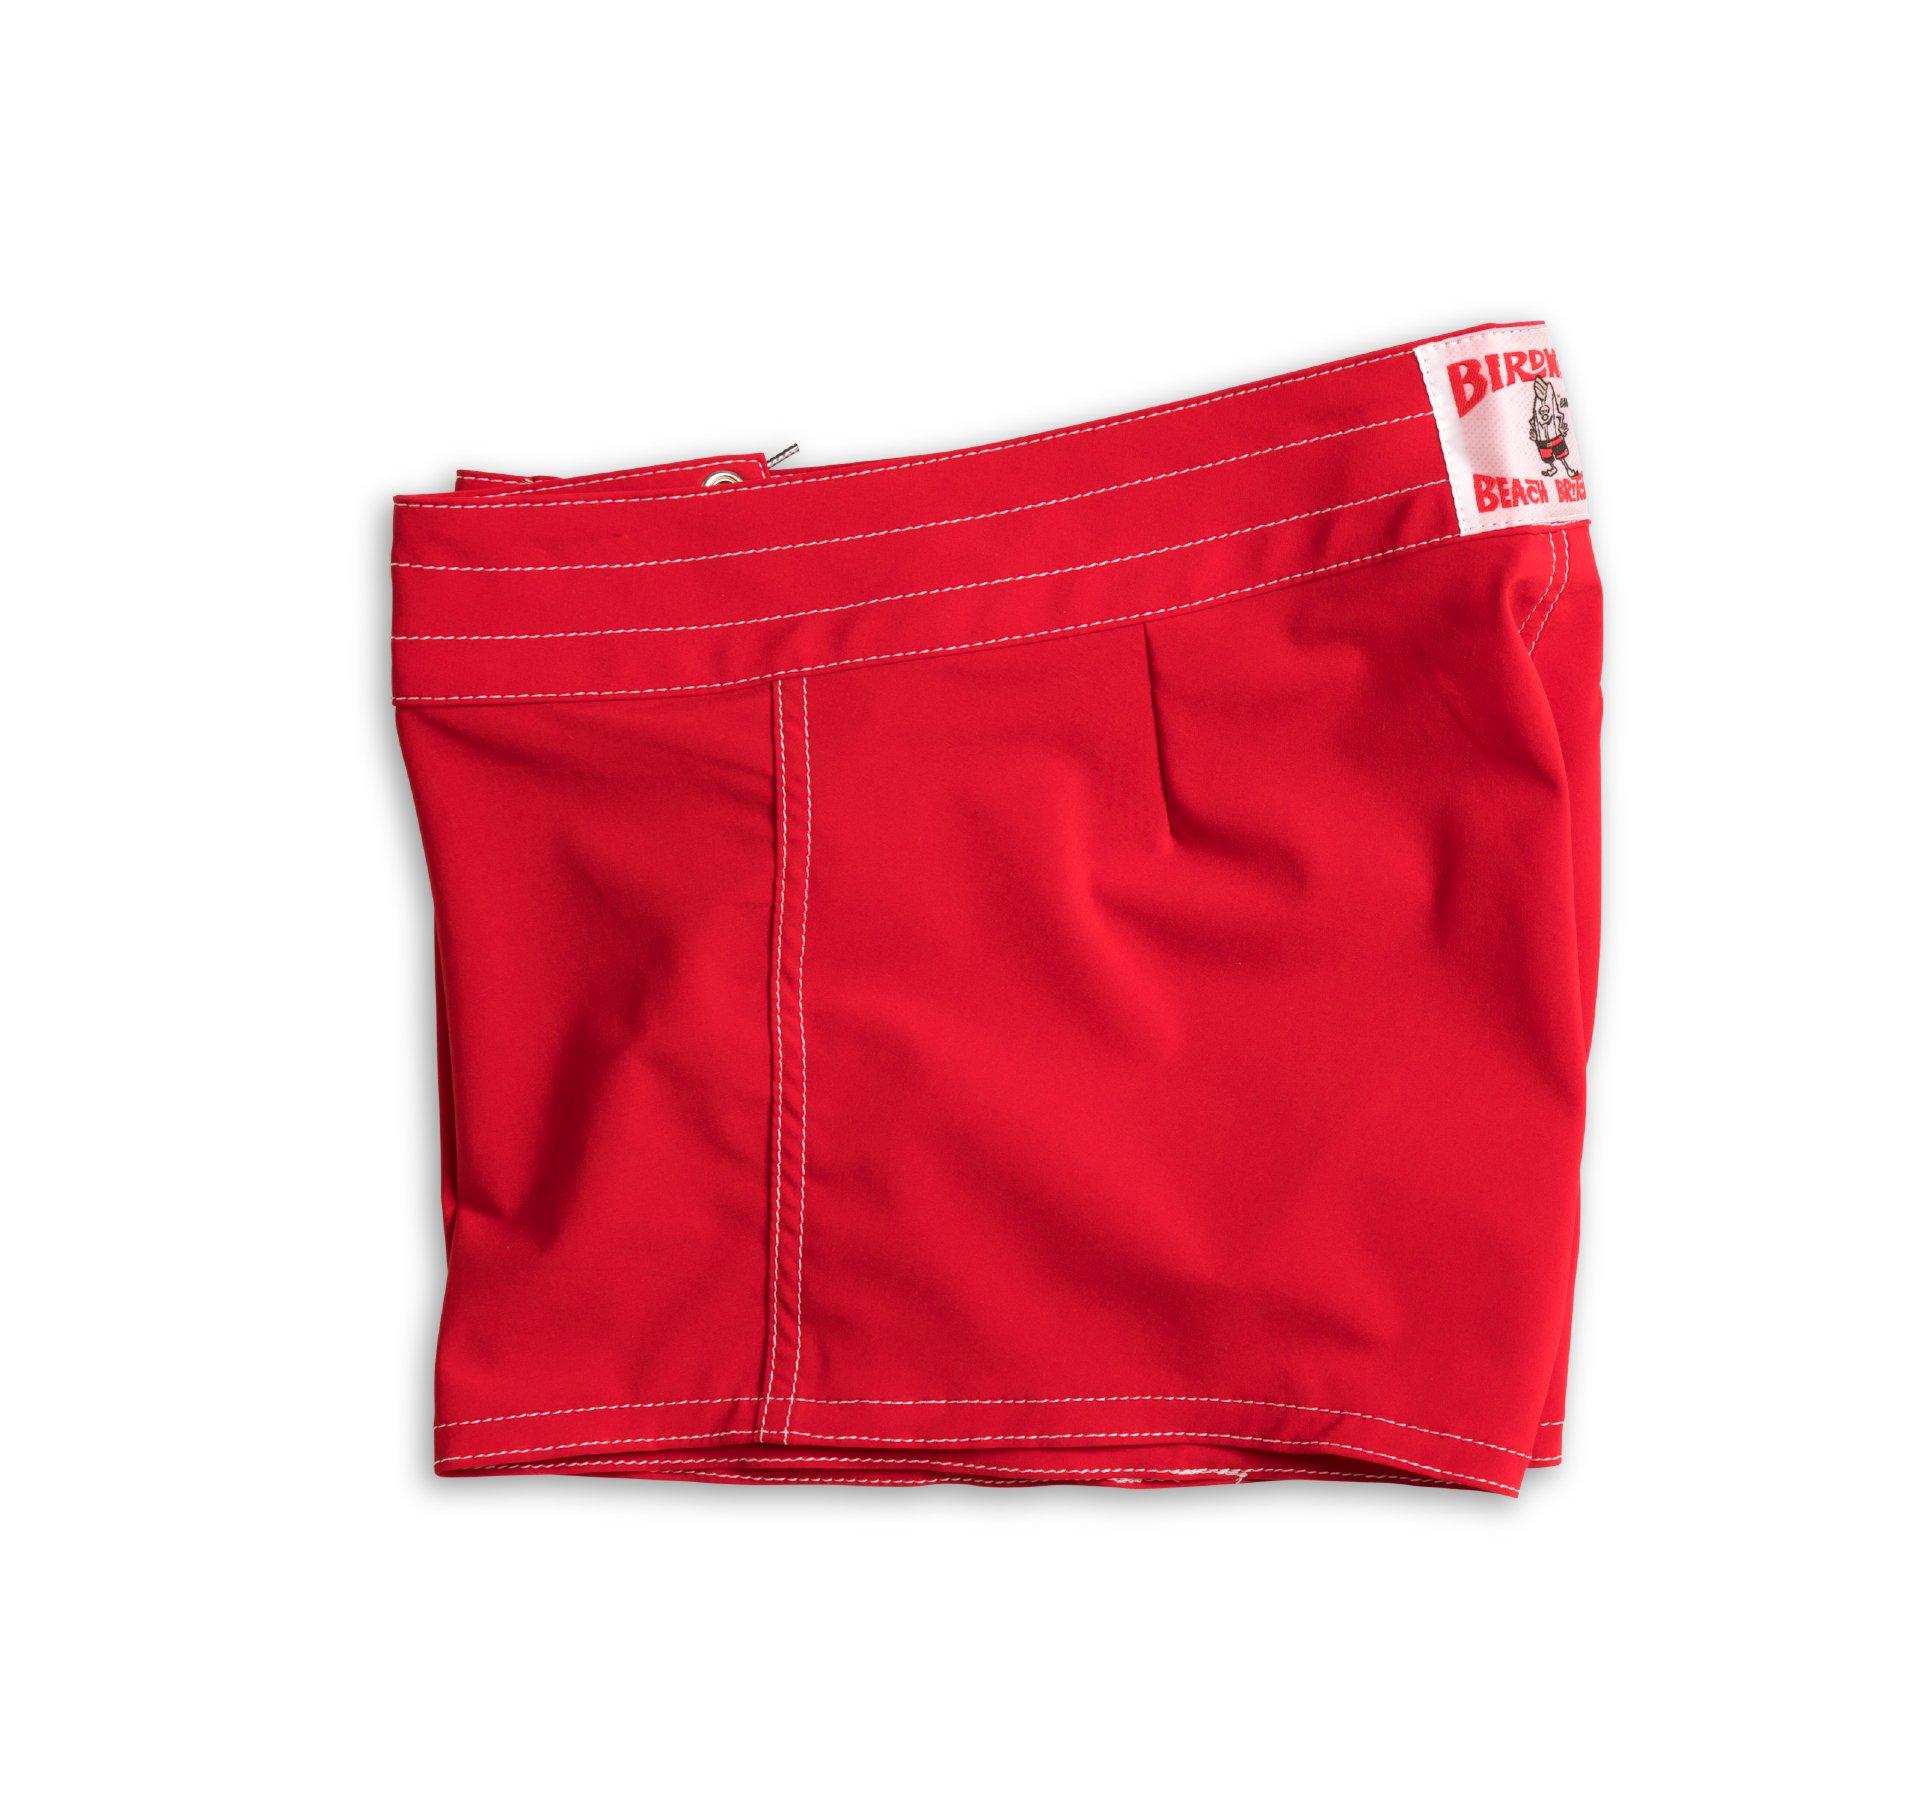 Birdwell Women's Stretch Board Shorts - Regular Rise (Red, 2) by Birdwell Beach Britches (Image #4)